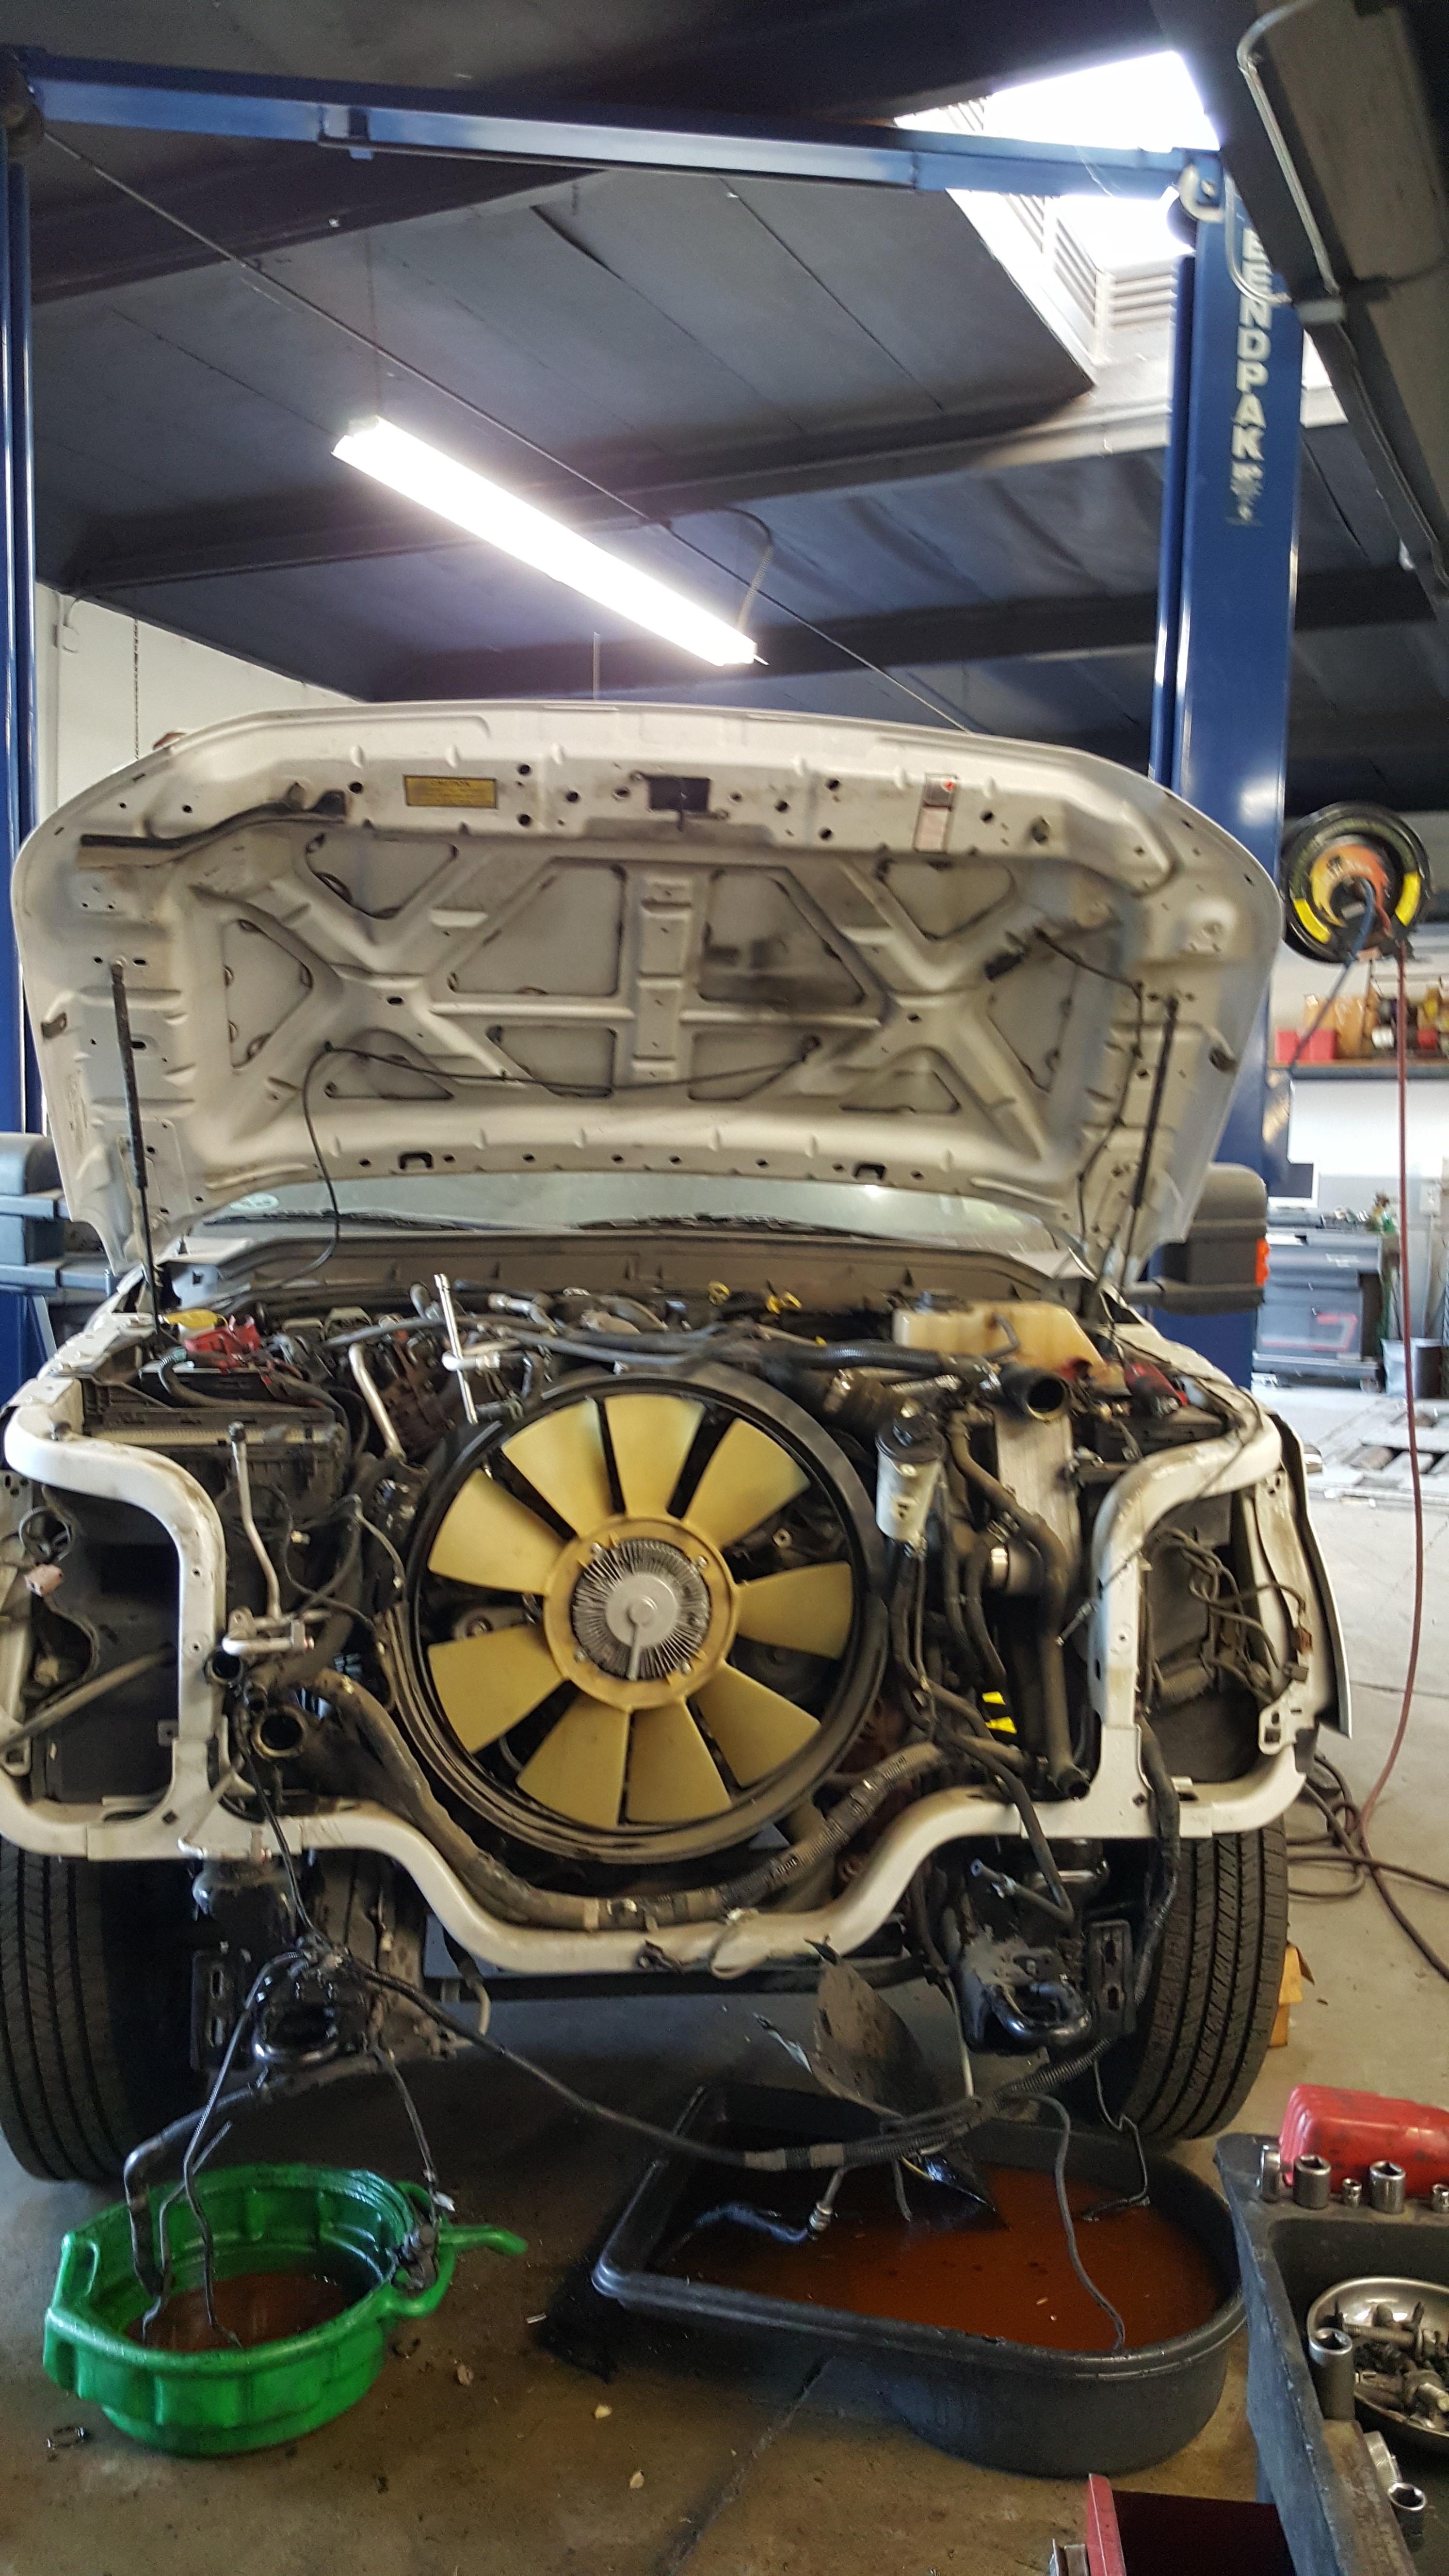 Diesel repair at Inland Auto & Truck Corona, CA 92882